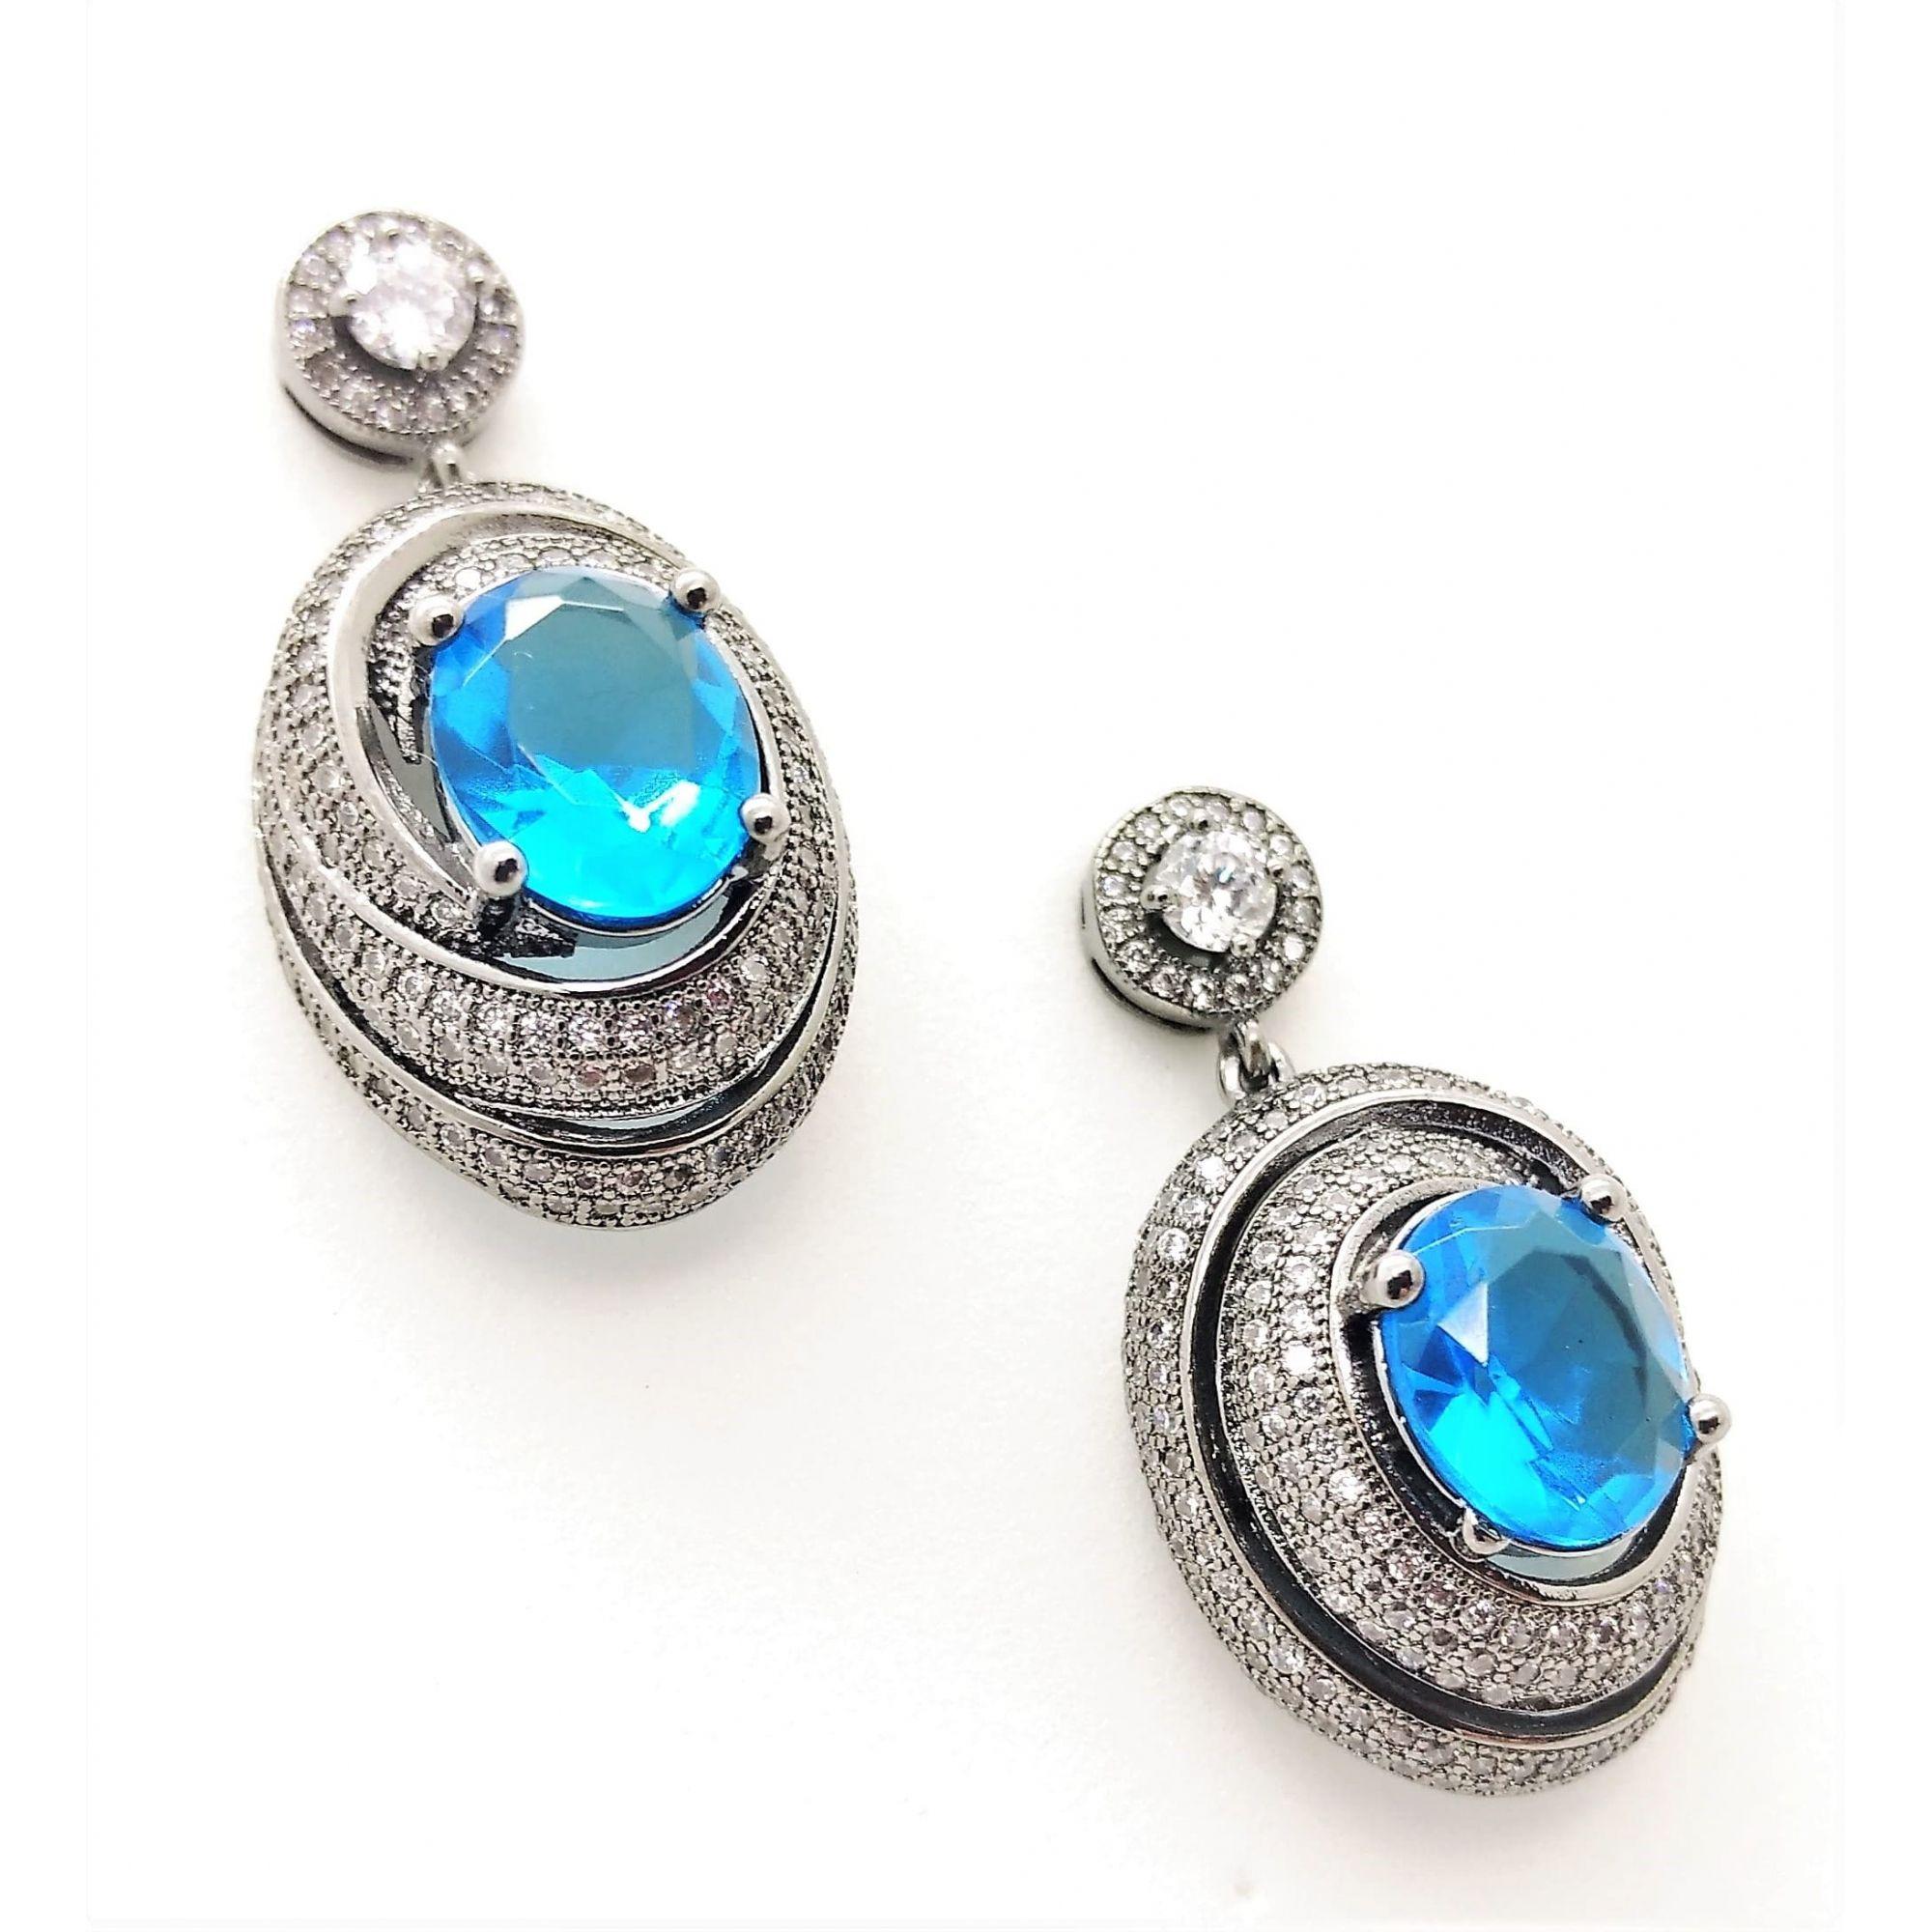 Brincos Caracol Cristal Azul Safira E Pavé De Microzirconias Ródio Negro 2384